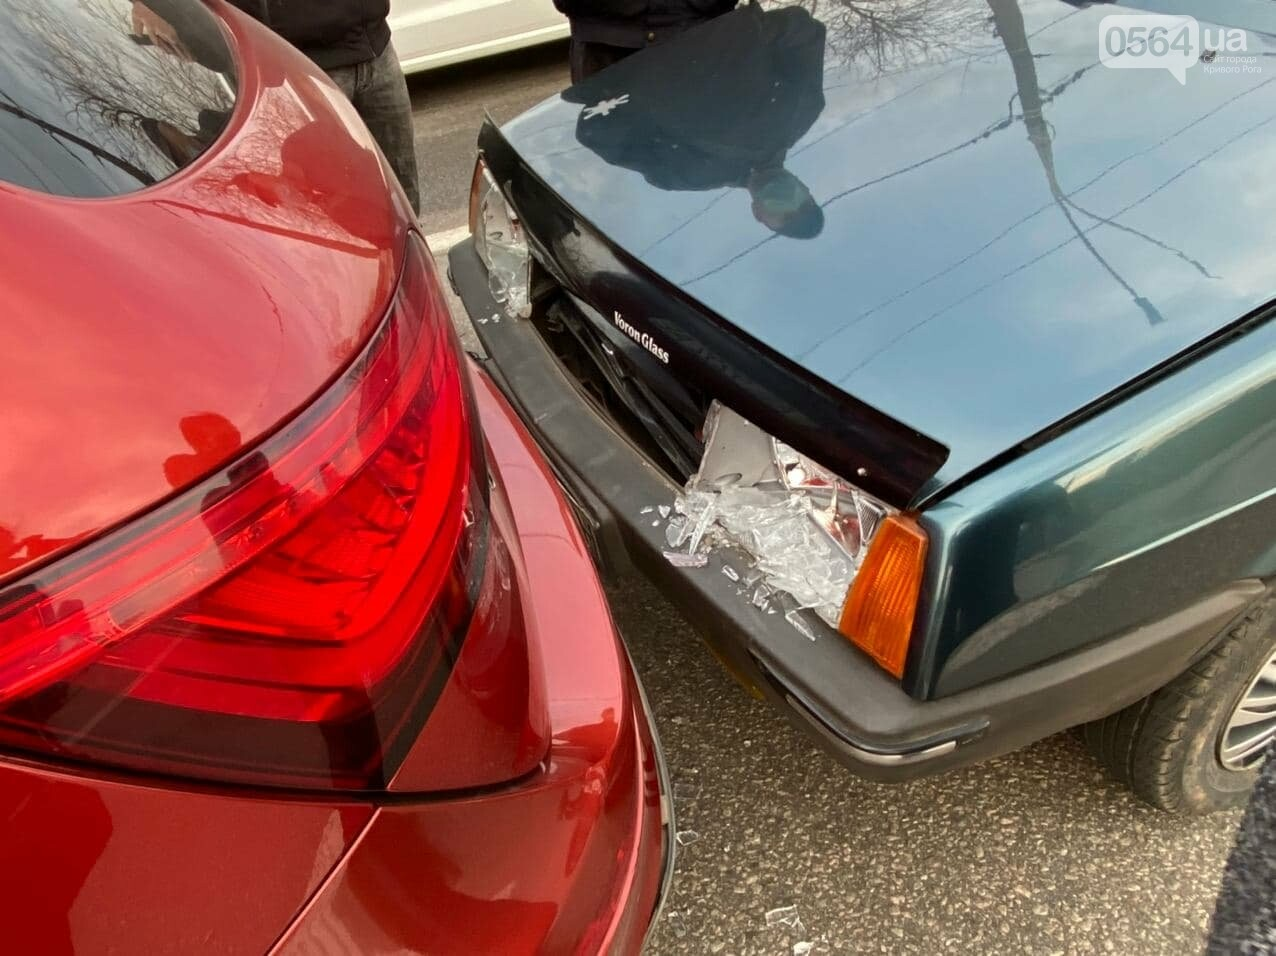 5 машин разбились в ДТП в Кривом Роге, - ФОТО, фото-2